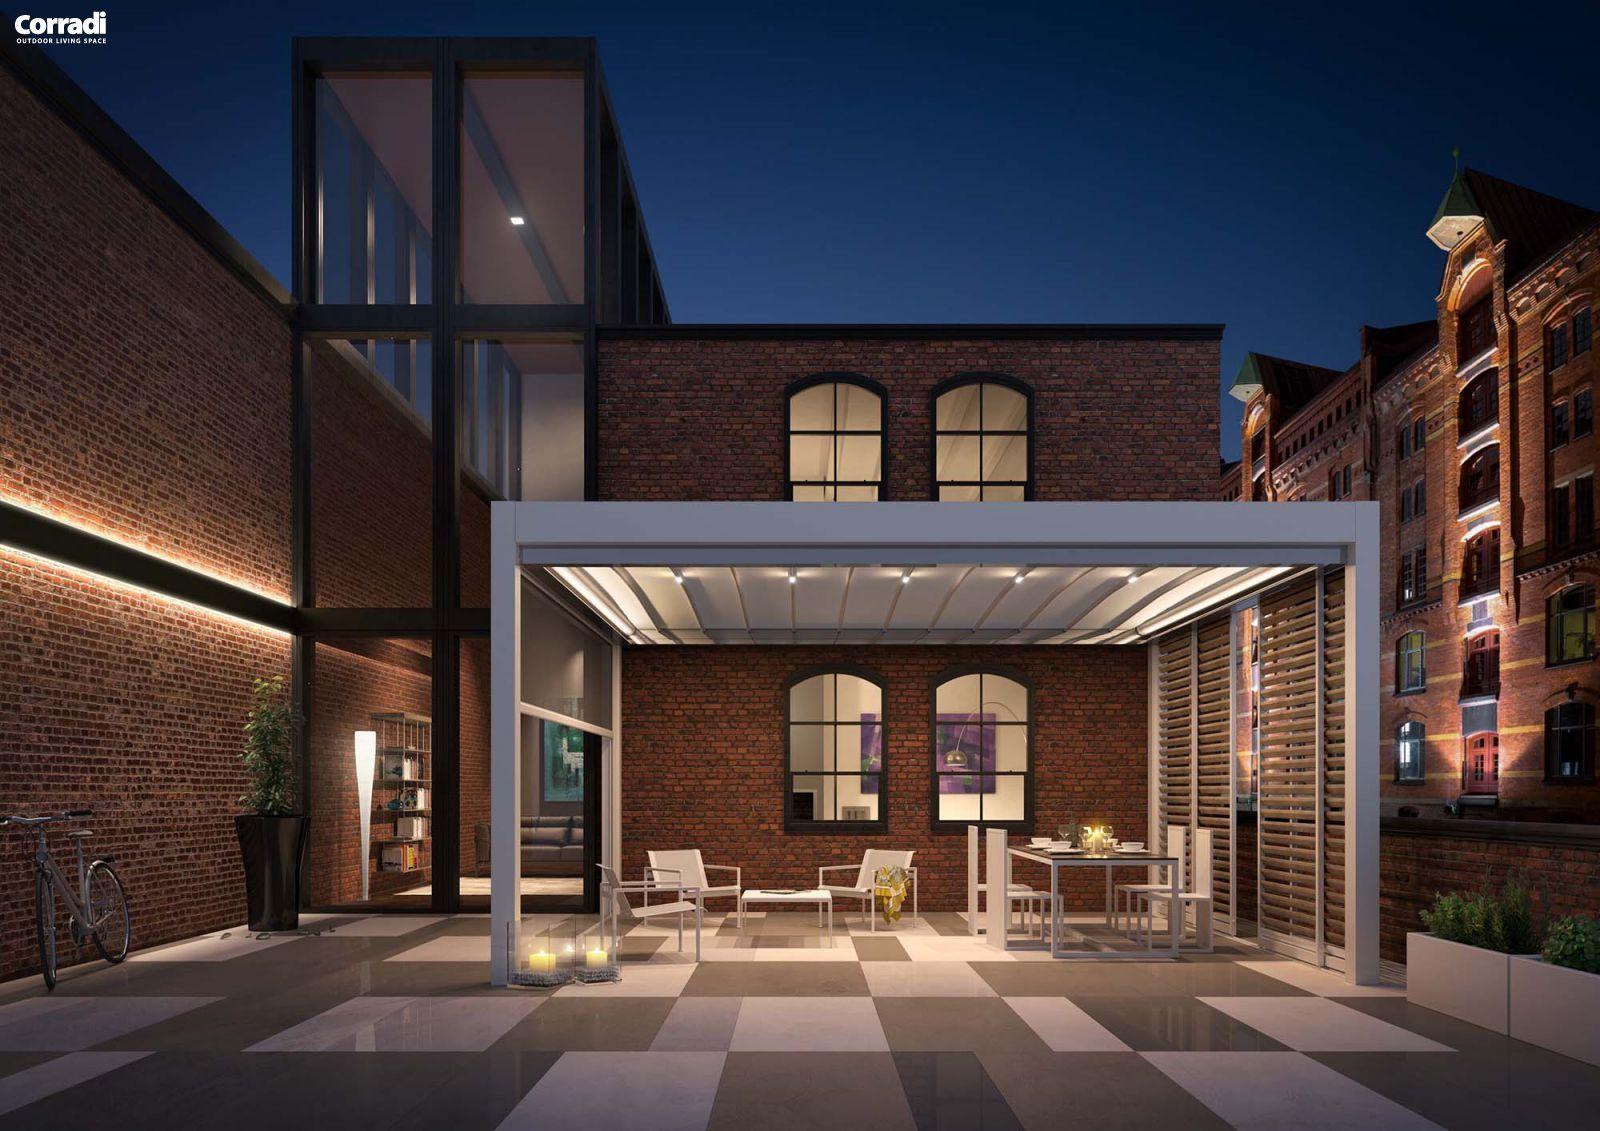 Corradi - Outdoor living space on Corradi Outdoor Living id=91075